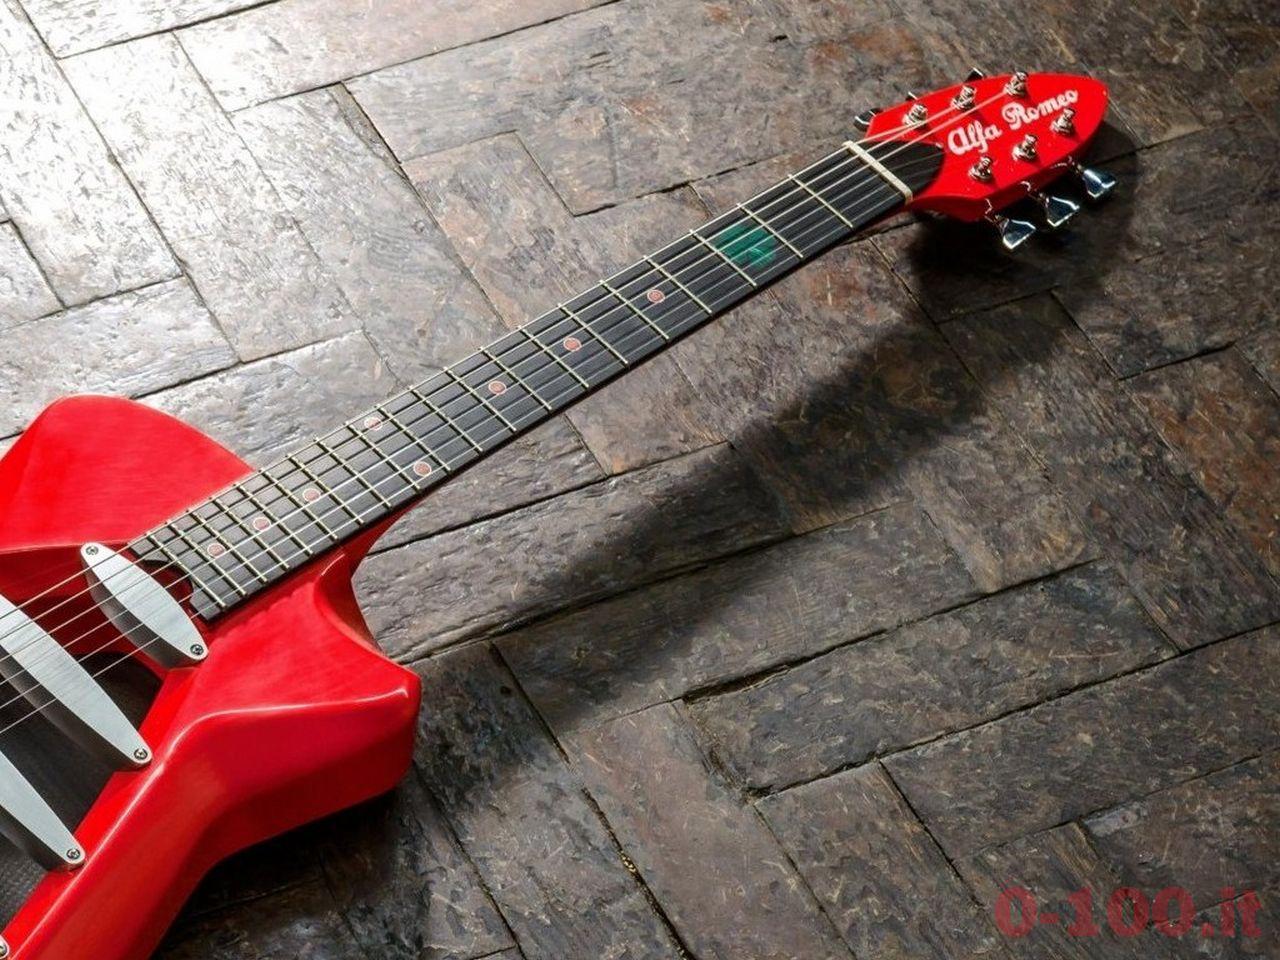 alfa-romeo-guitar-harrison-custom-guitar-works-104-anni-biscione_0-1006